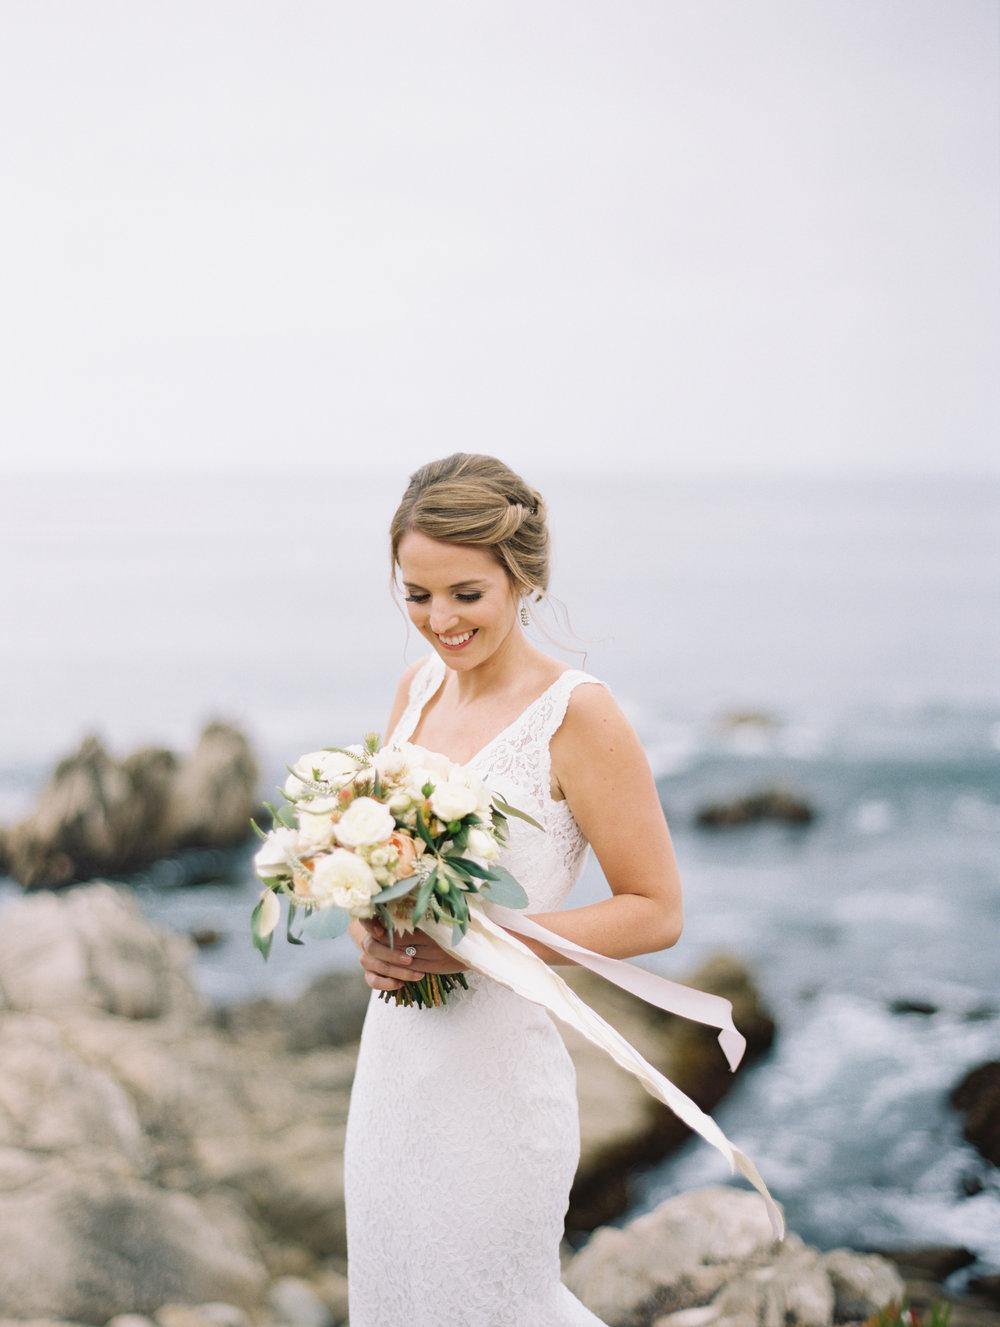 288-fine-art-film-photographer-carmel-california-destination-wedding-brumley-wells-tim-courtney.jpg